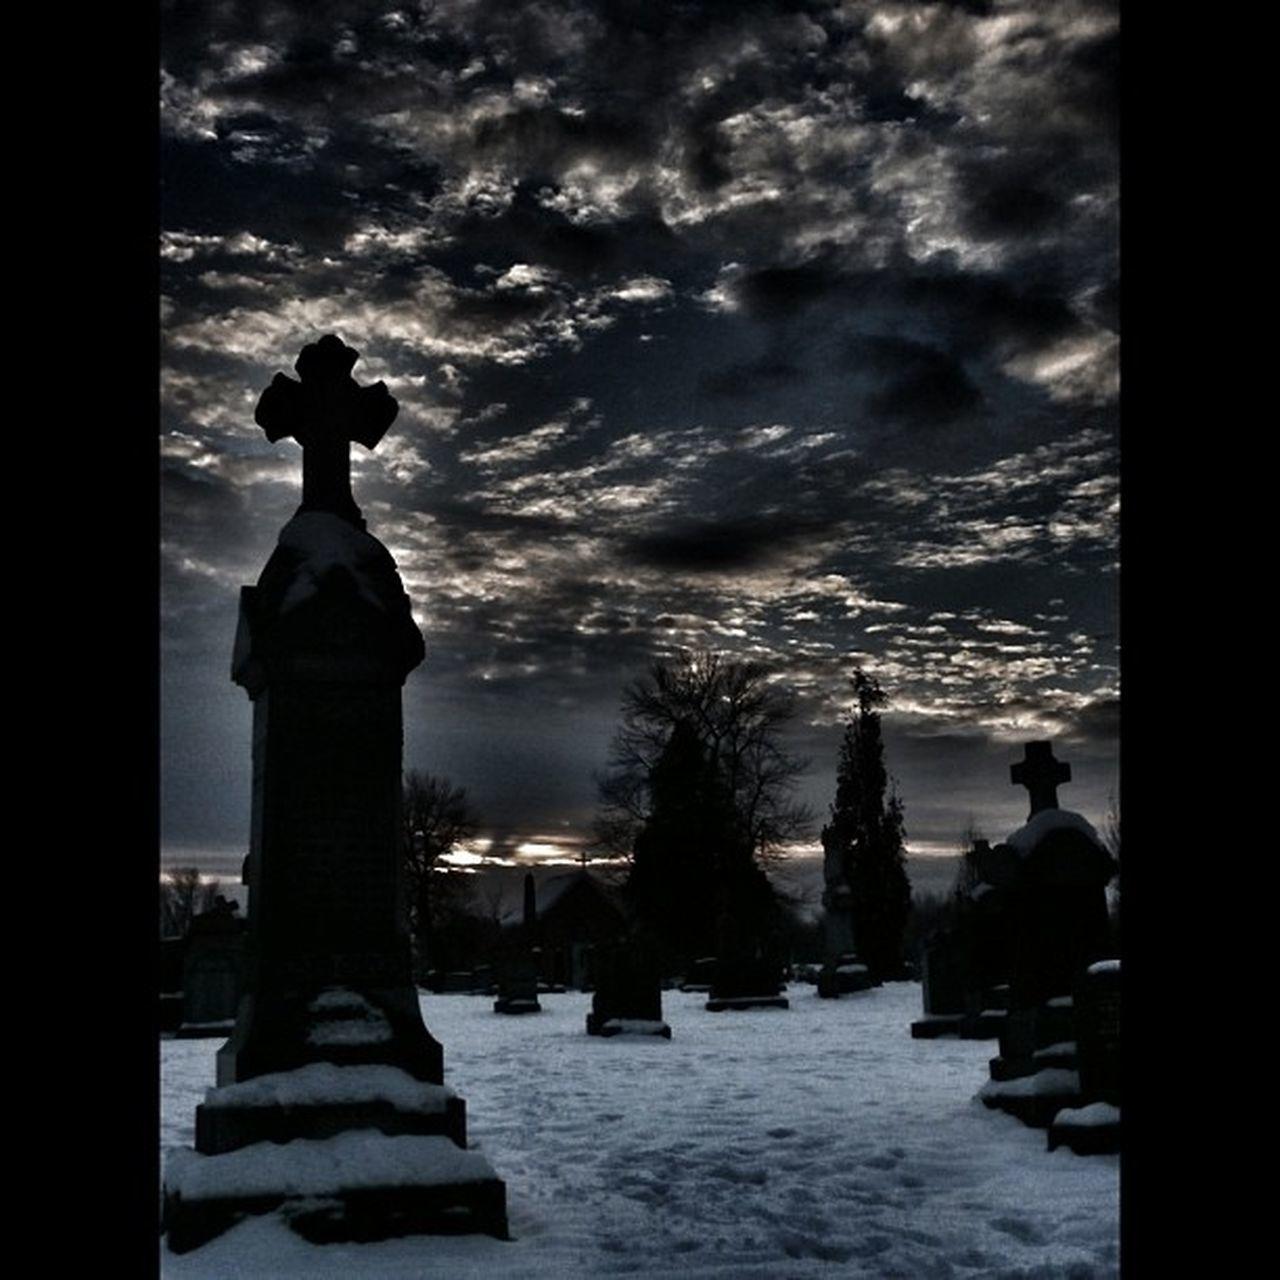 #rsa_dark #graveyard_dead #masters_of_darkness #ig_dungeon Eclectic_edits Rsa_dark Masters_of_darkness Graveyard_dead Ig_dungeon Gdark_invite Dark_captures